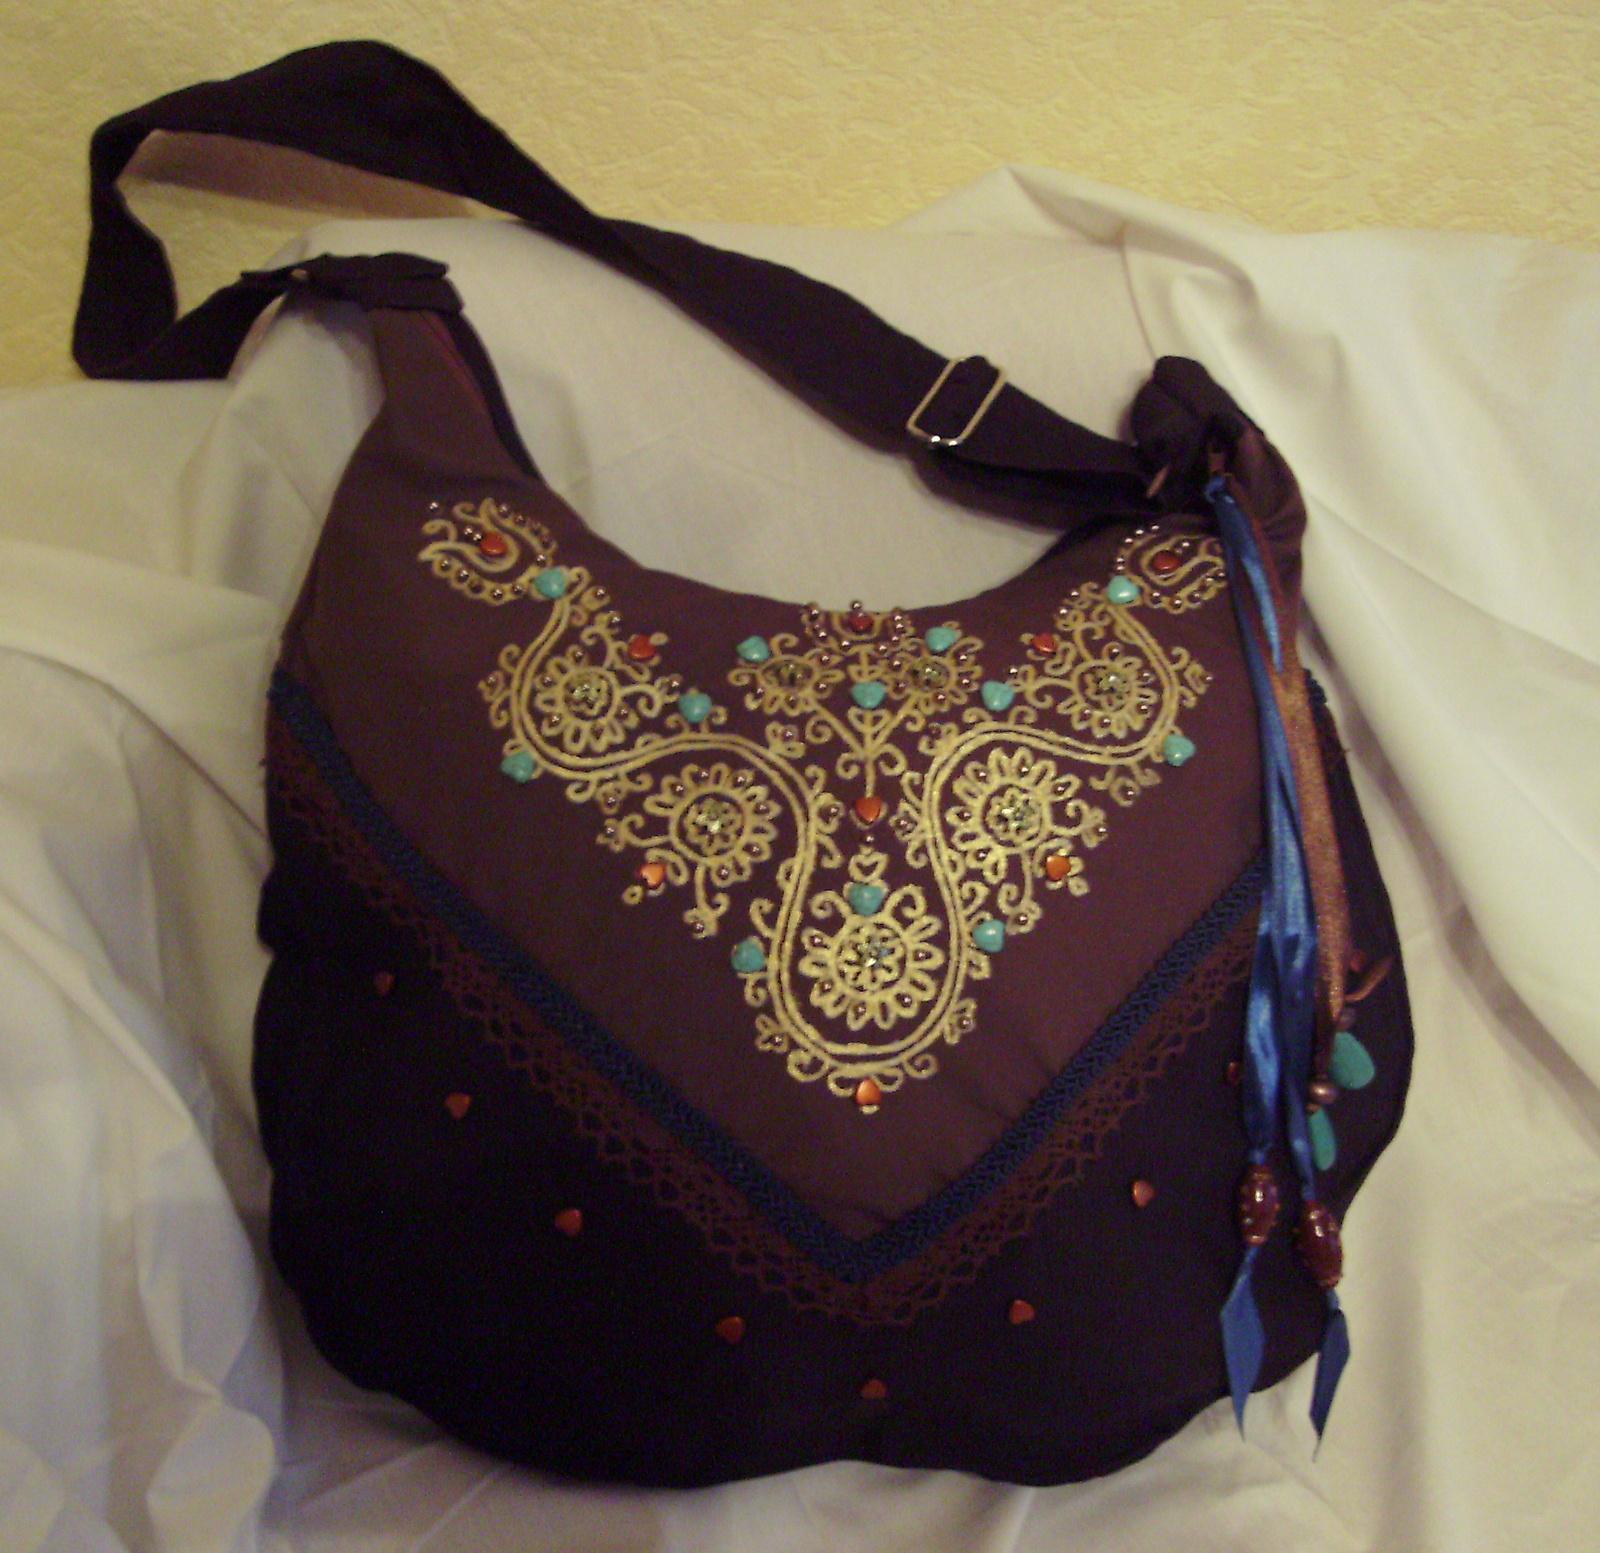 06 Barna-türkisz virágos táska